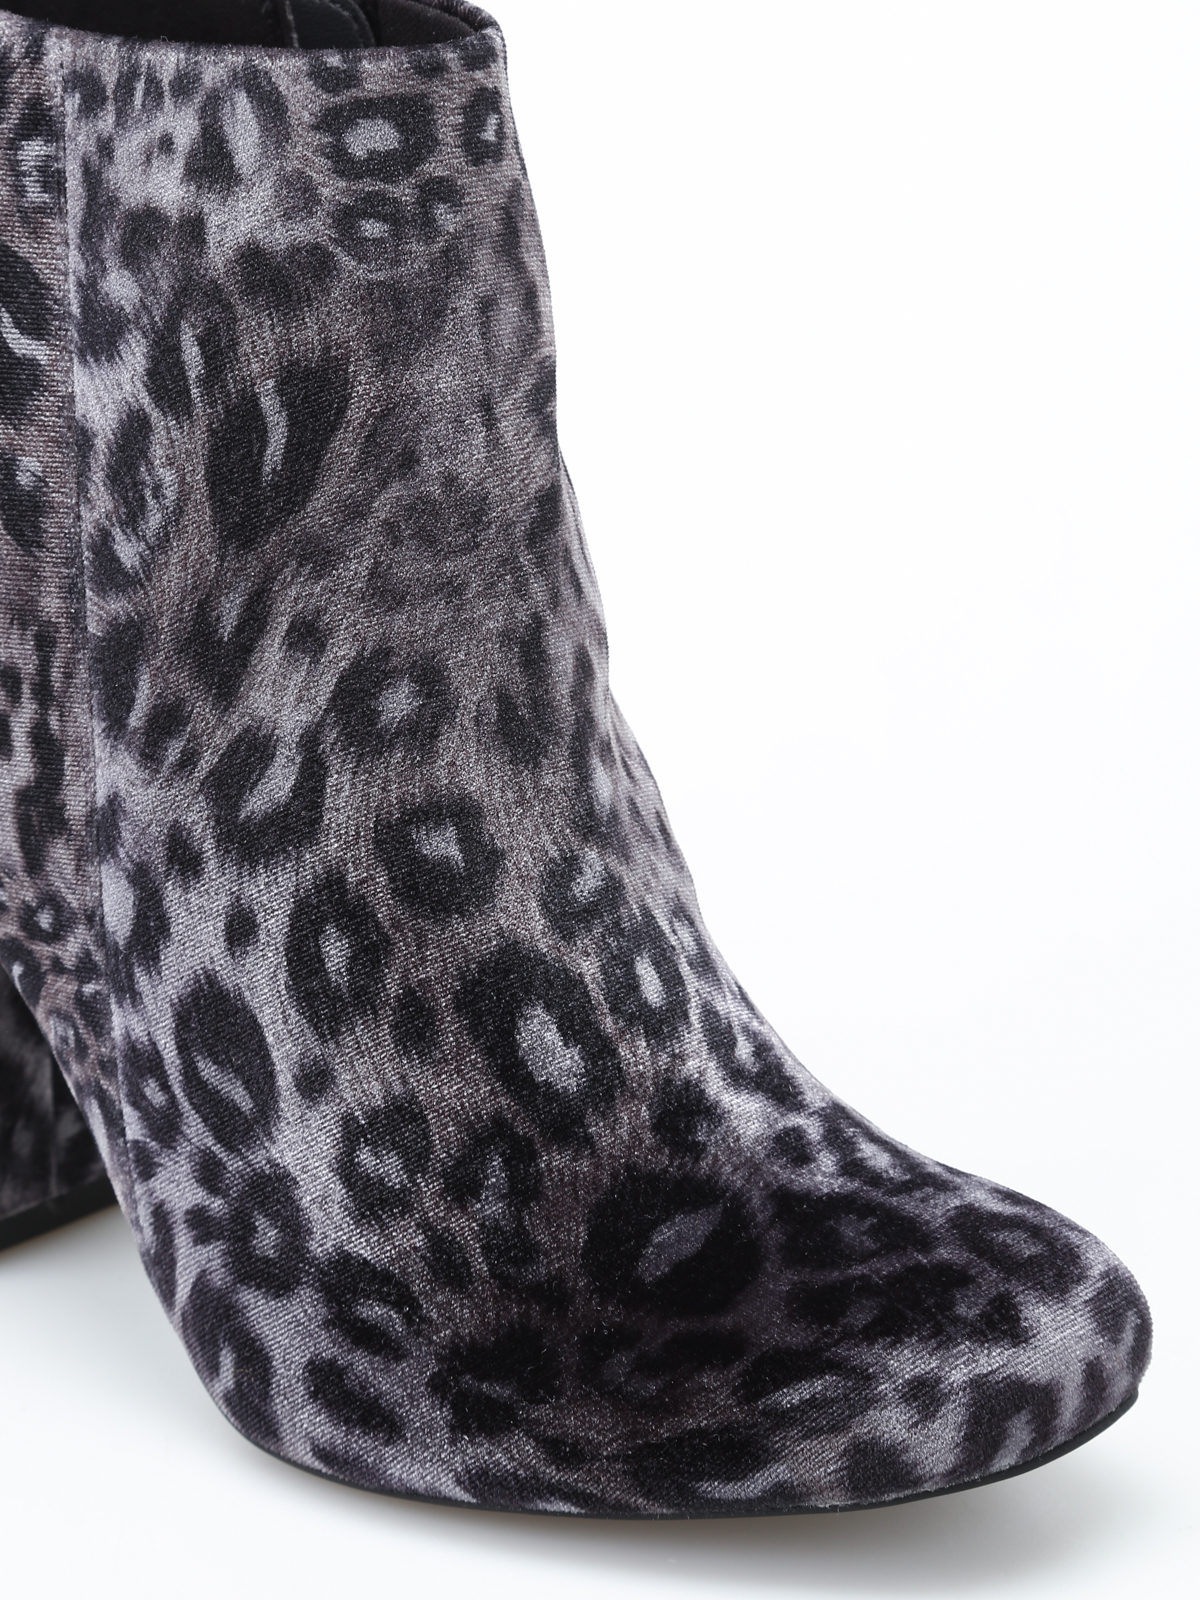 Bottines et boots Steve Madden Pacers pour Femme 7I4cd